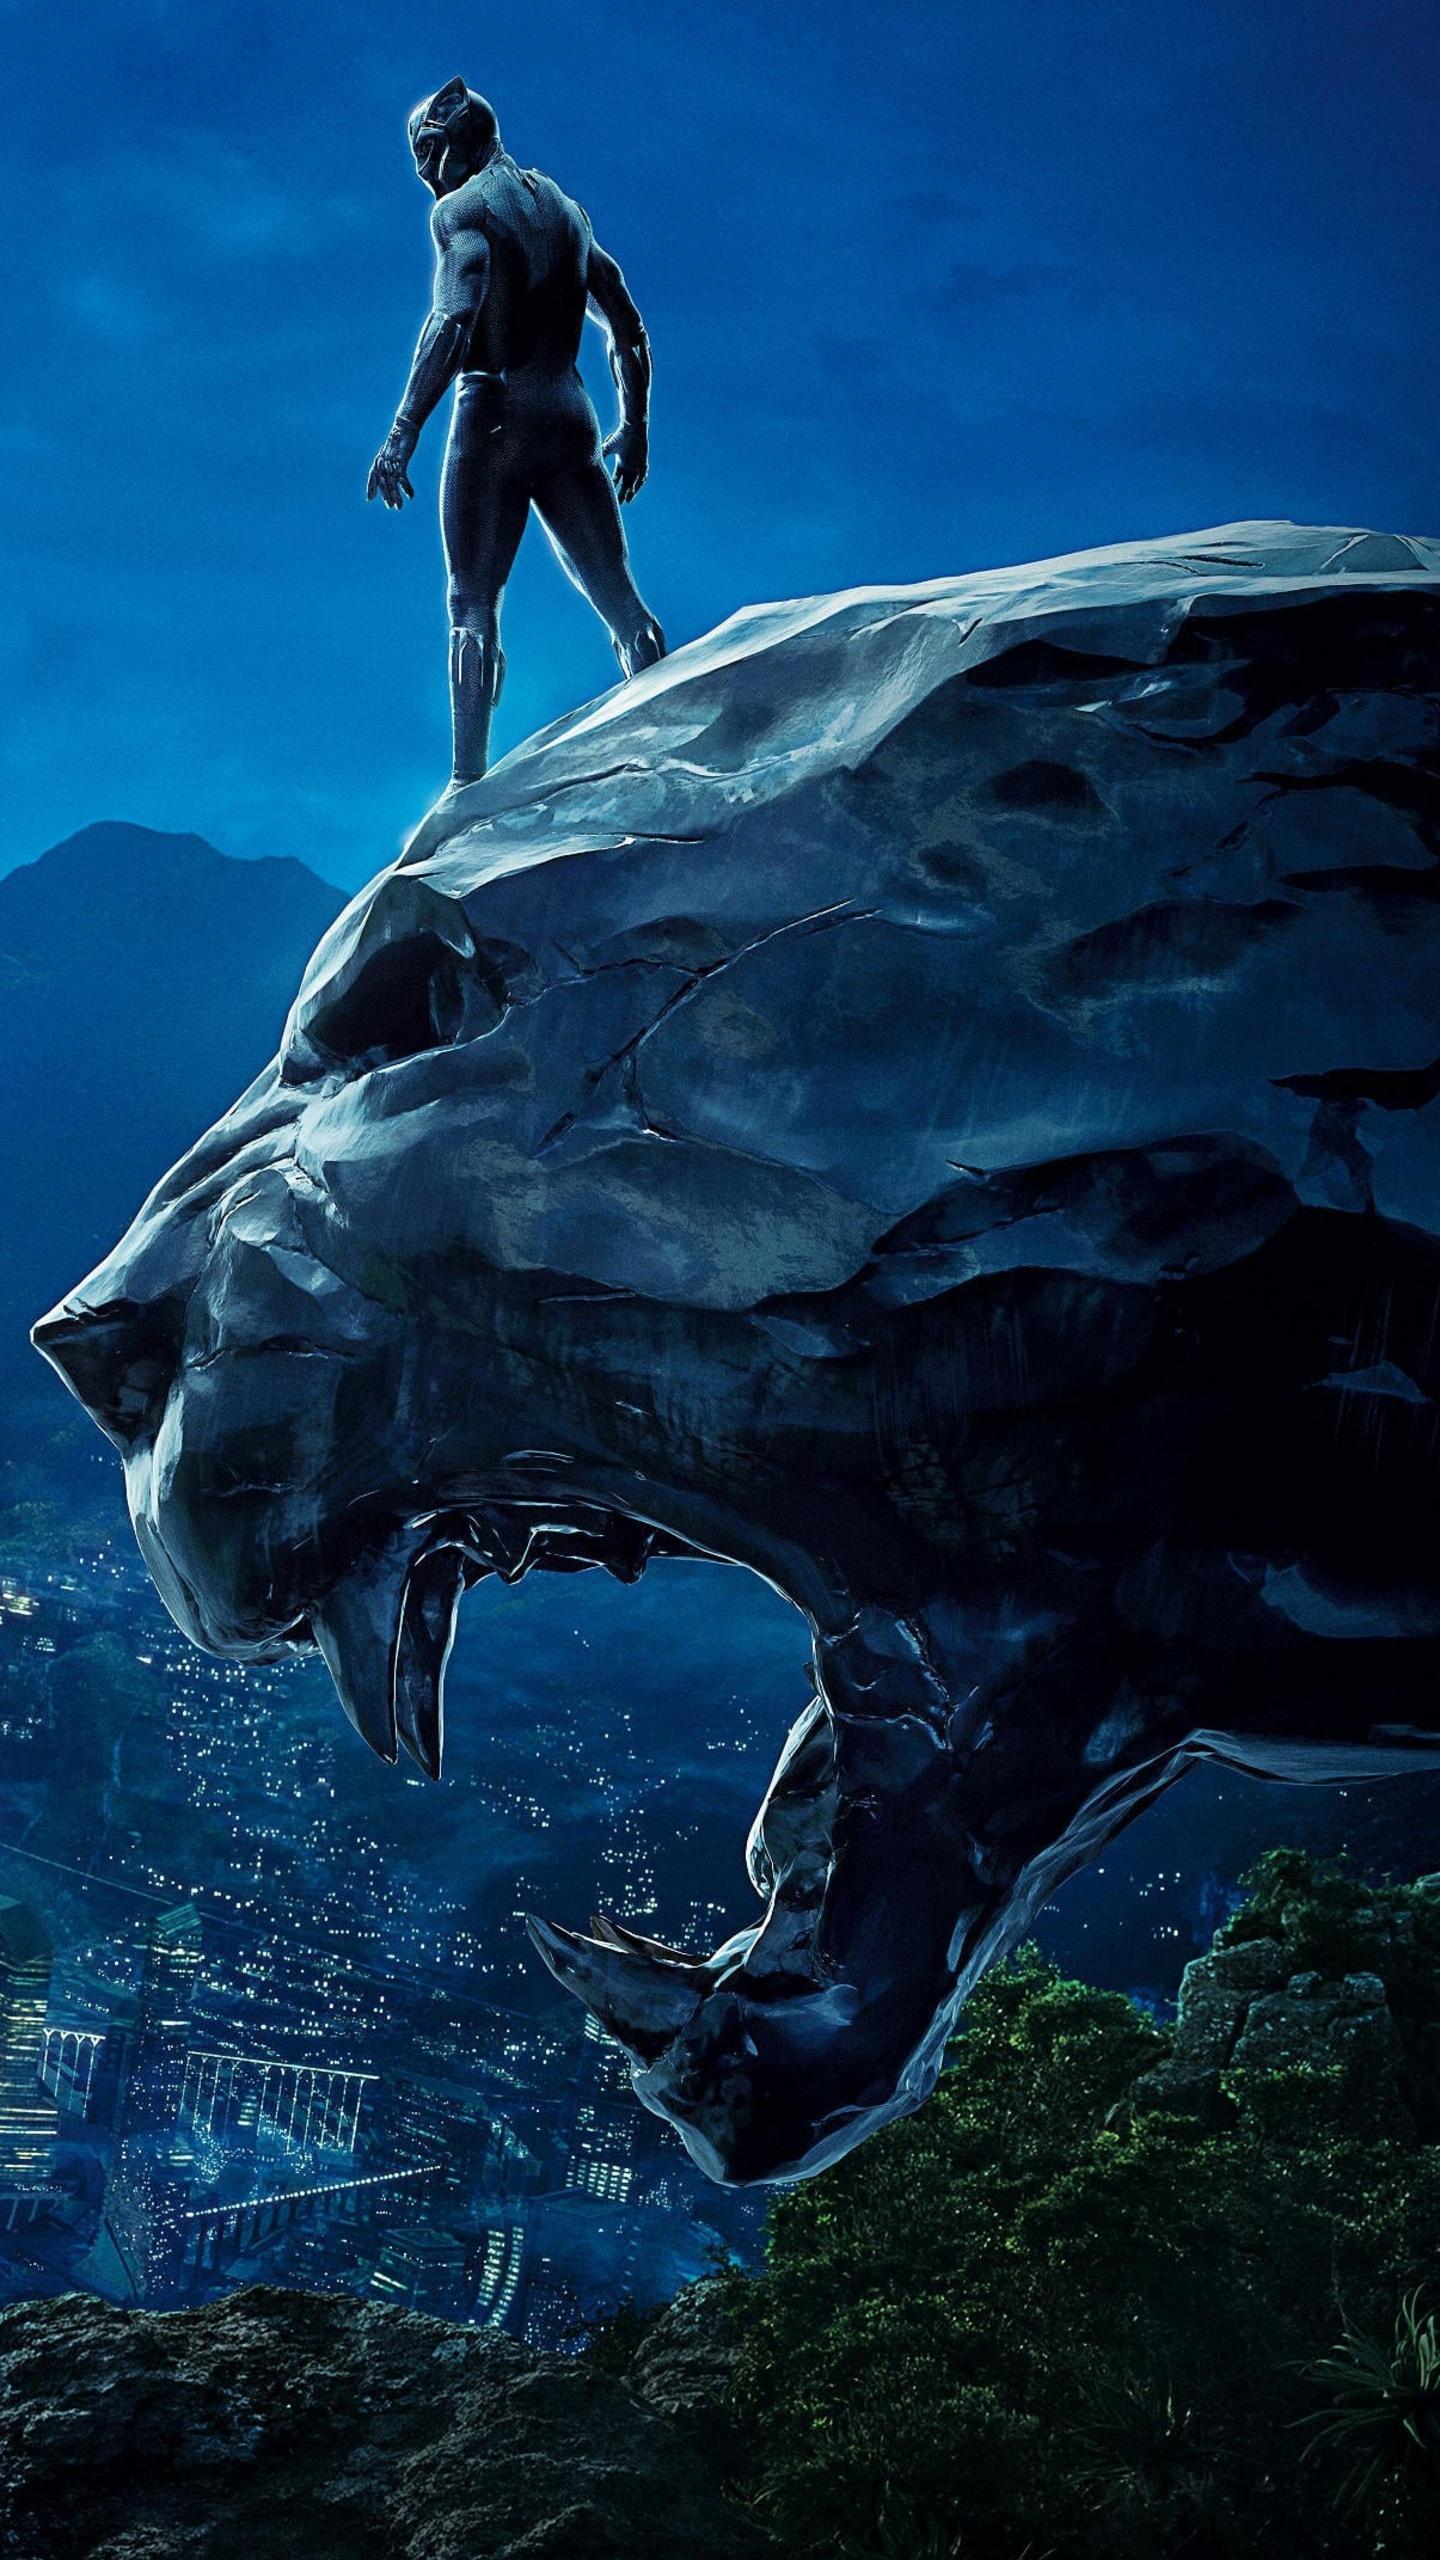 1440x2560 Black Panther 4k Movie Poster Samsung Galaxy S6 ...